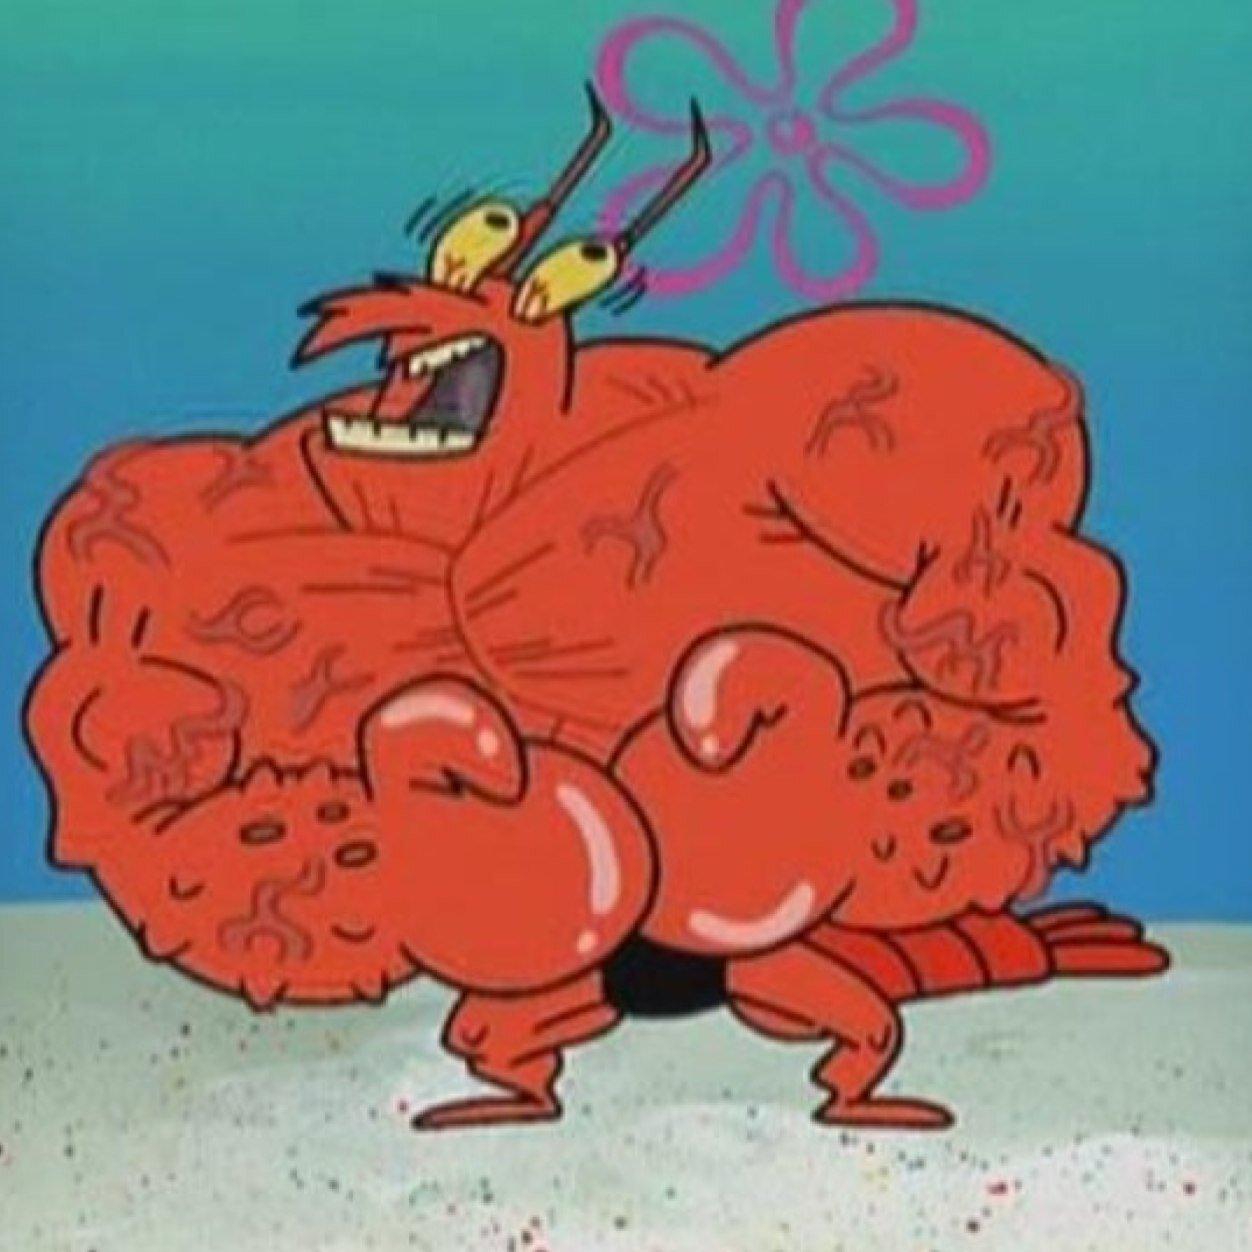 Larry The Lobster At Larryflexx Twitter